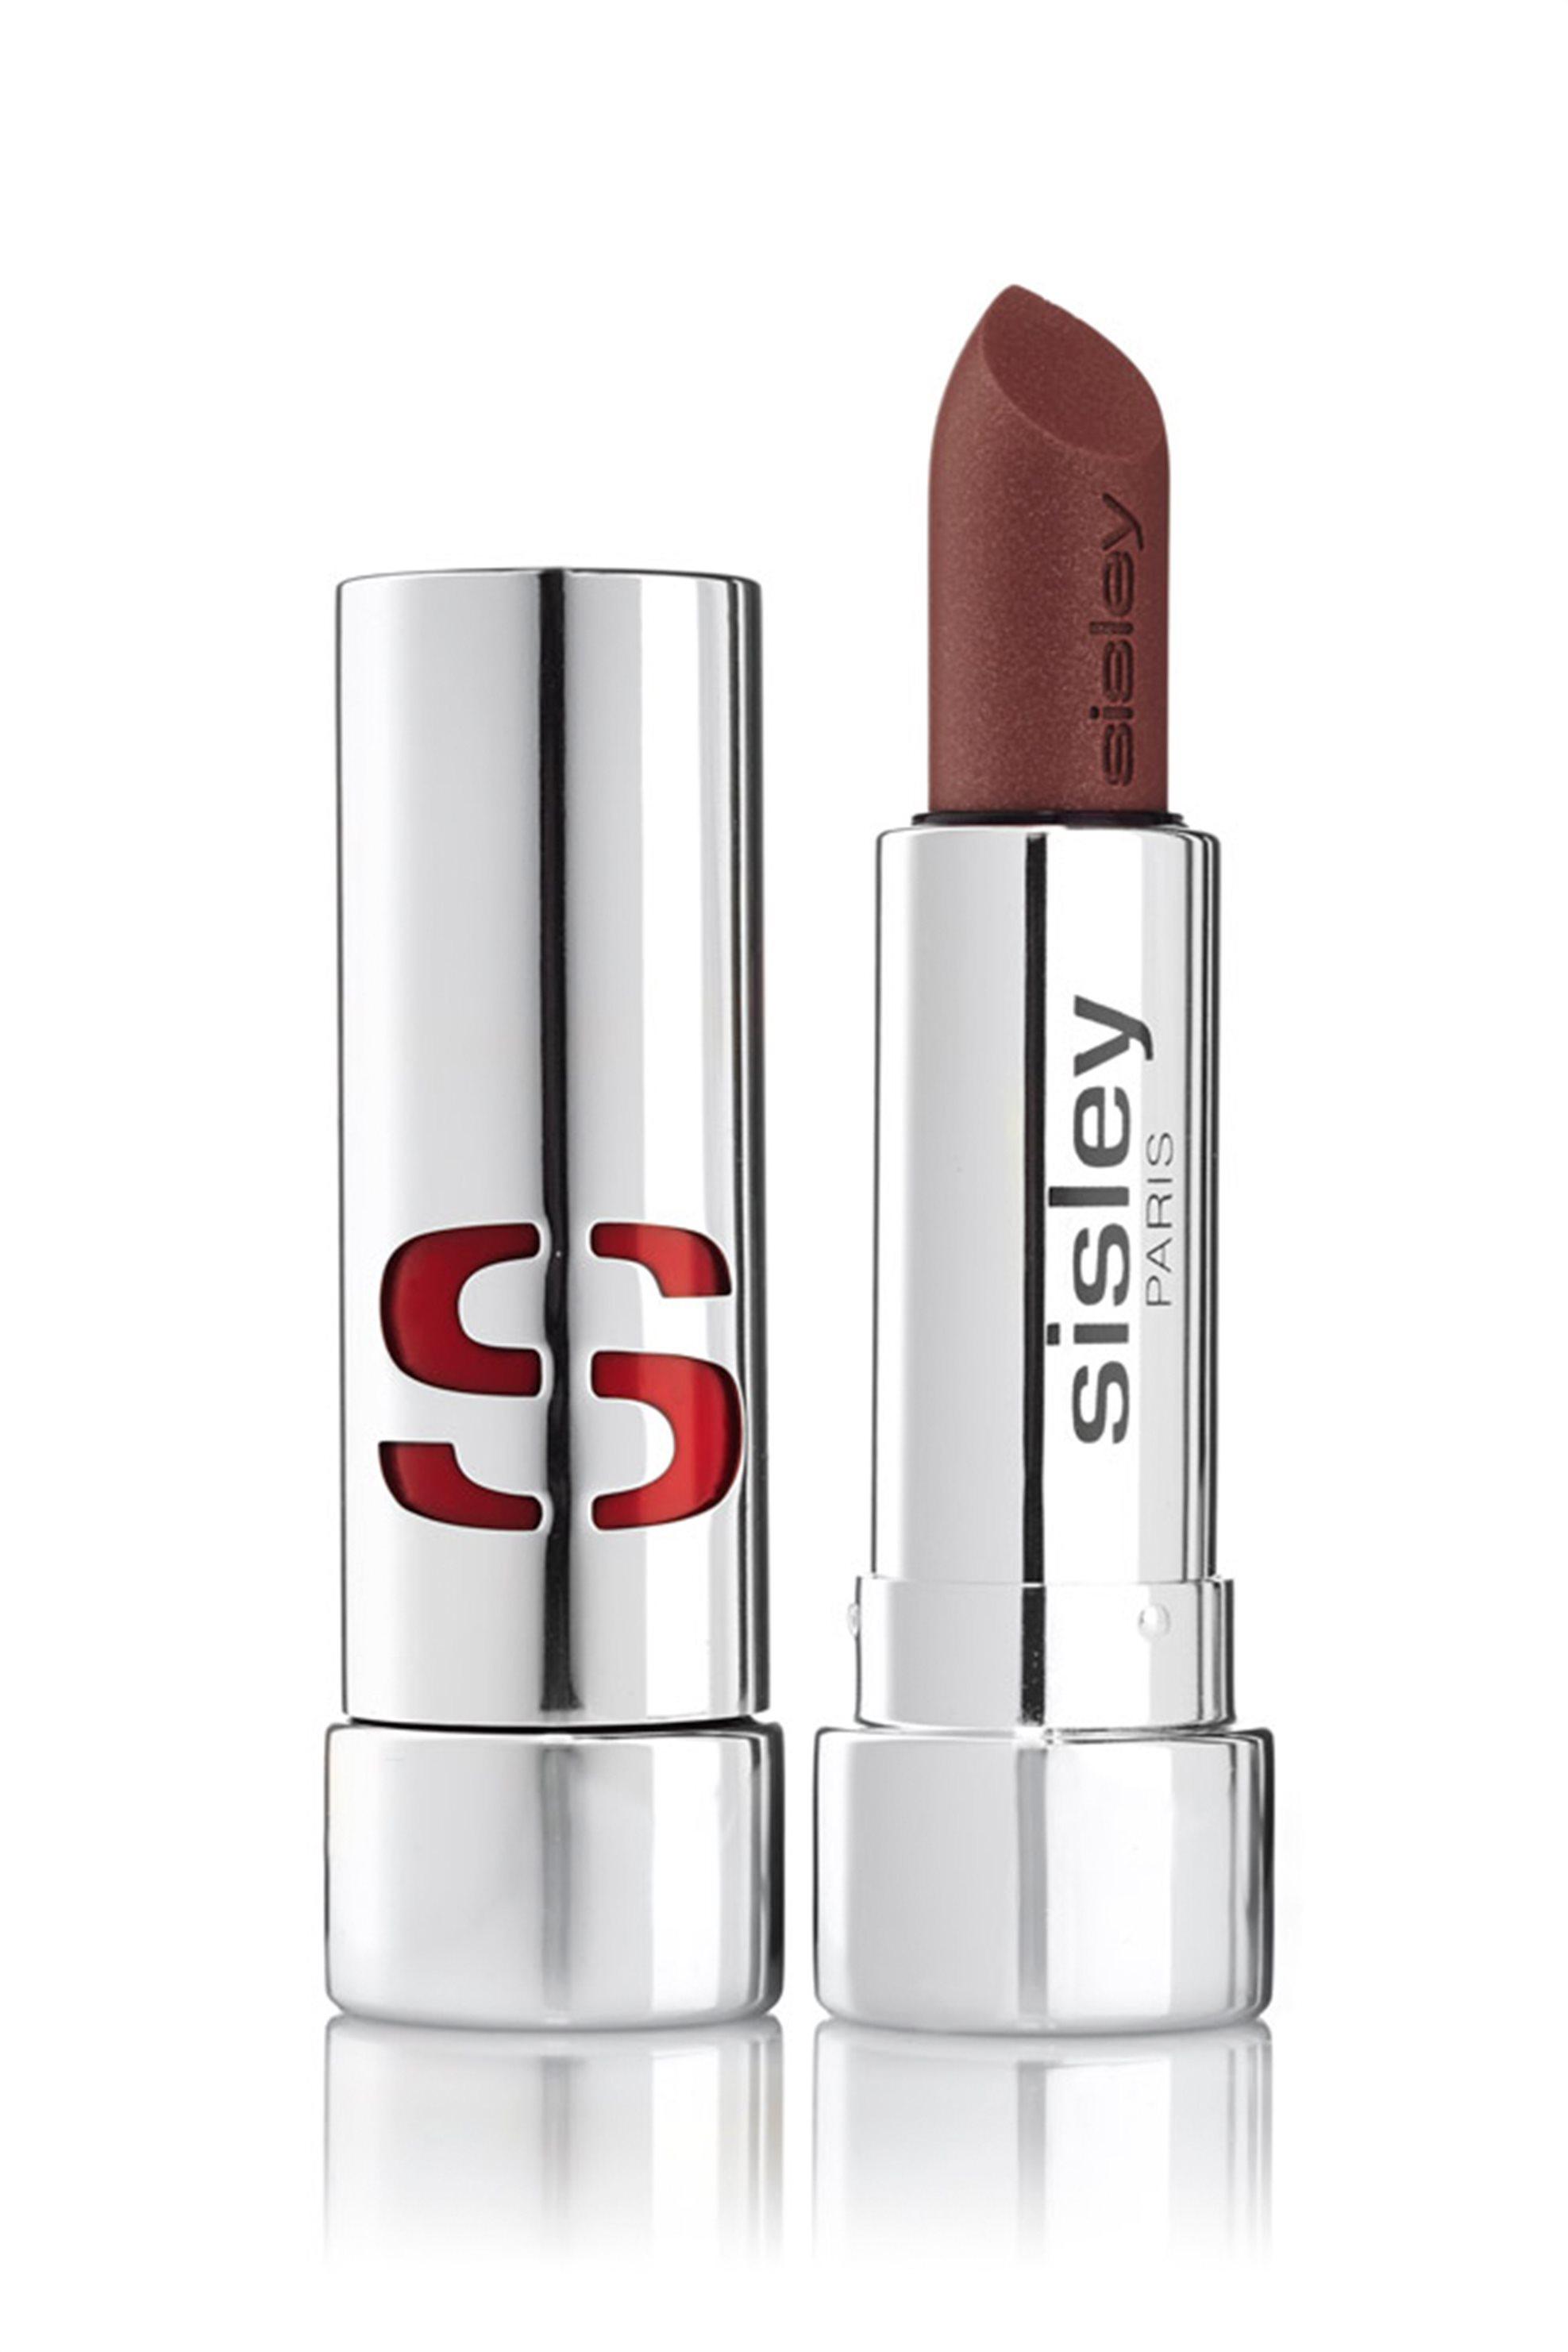 Sisley Phyto-Lip Shine 13 Sheer Beige 3 gr. - 170413 ομορφια   καλλυντικα επιλεκτικησ   μακιγιάζ   χείλη   κραγιόν